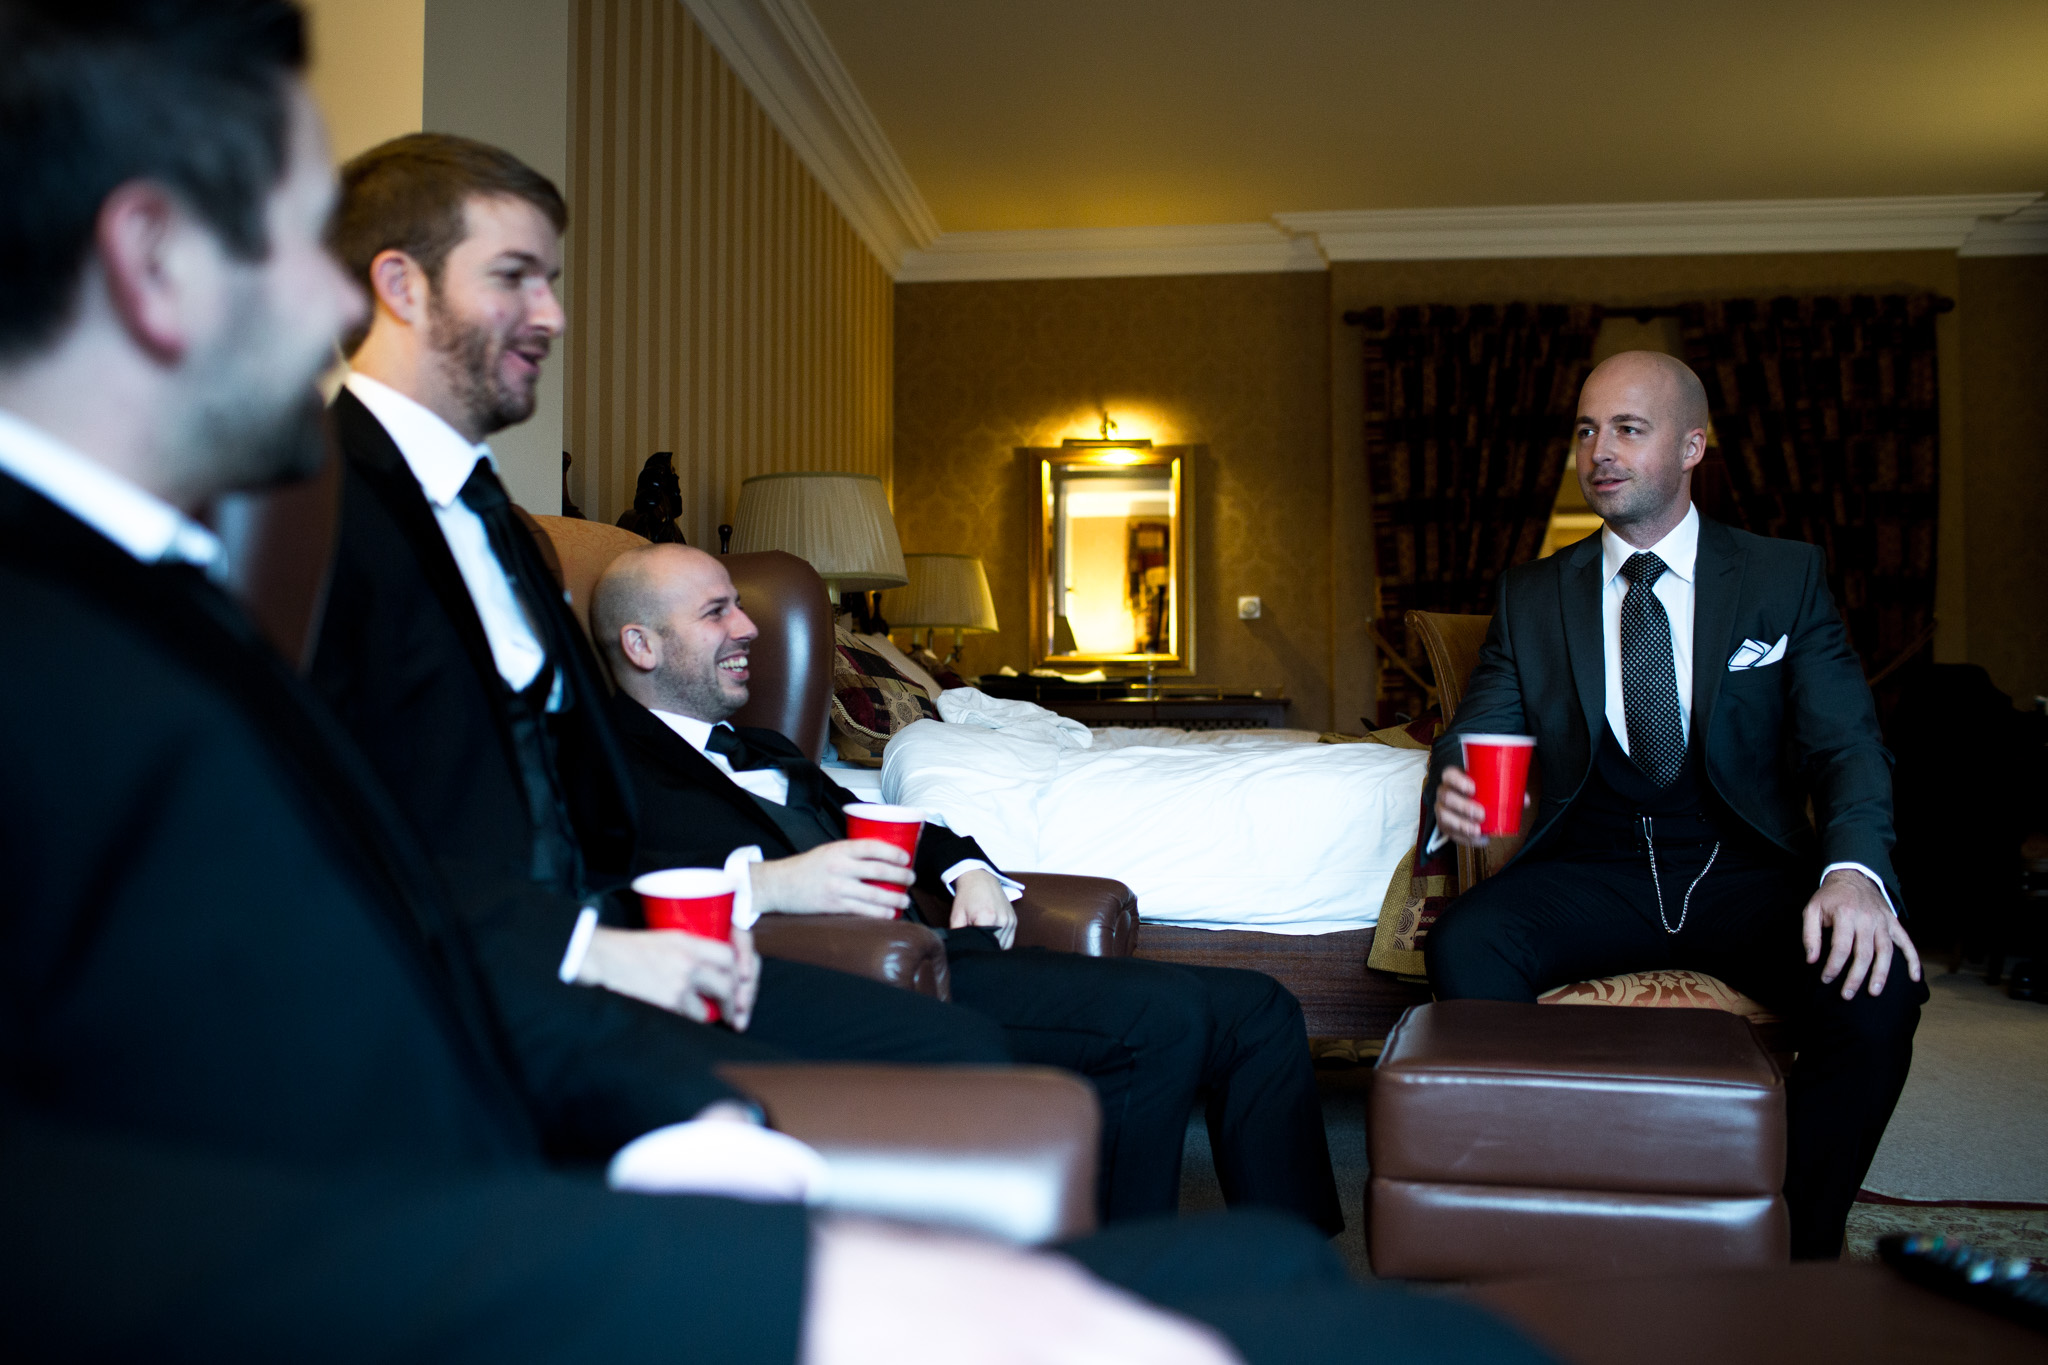 Mark_Barnes_Northern_Ireland_wedding_photographer_Harveys_Point_Donegall_Wedding_photography-Adam&Gemma-9.jpg